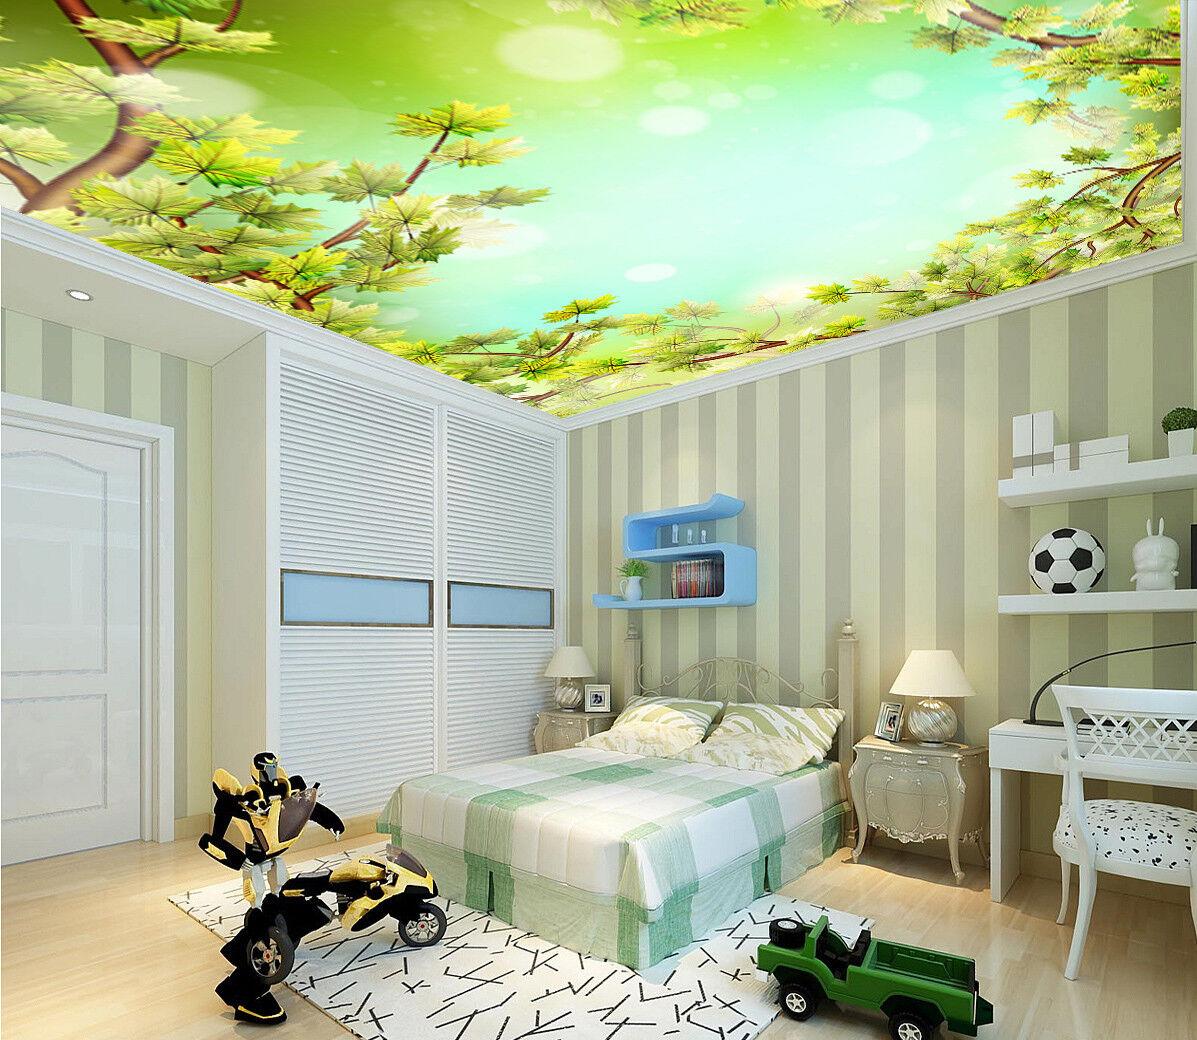 3D Sycamore Tree 833 Ceiling WallPaper Murals Wall Print Decal Deco AJ WALLPAPER